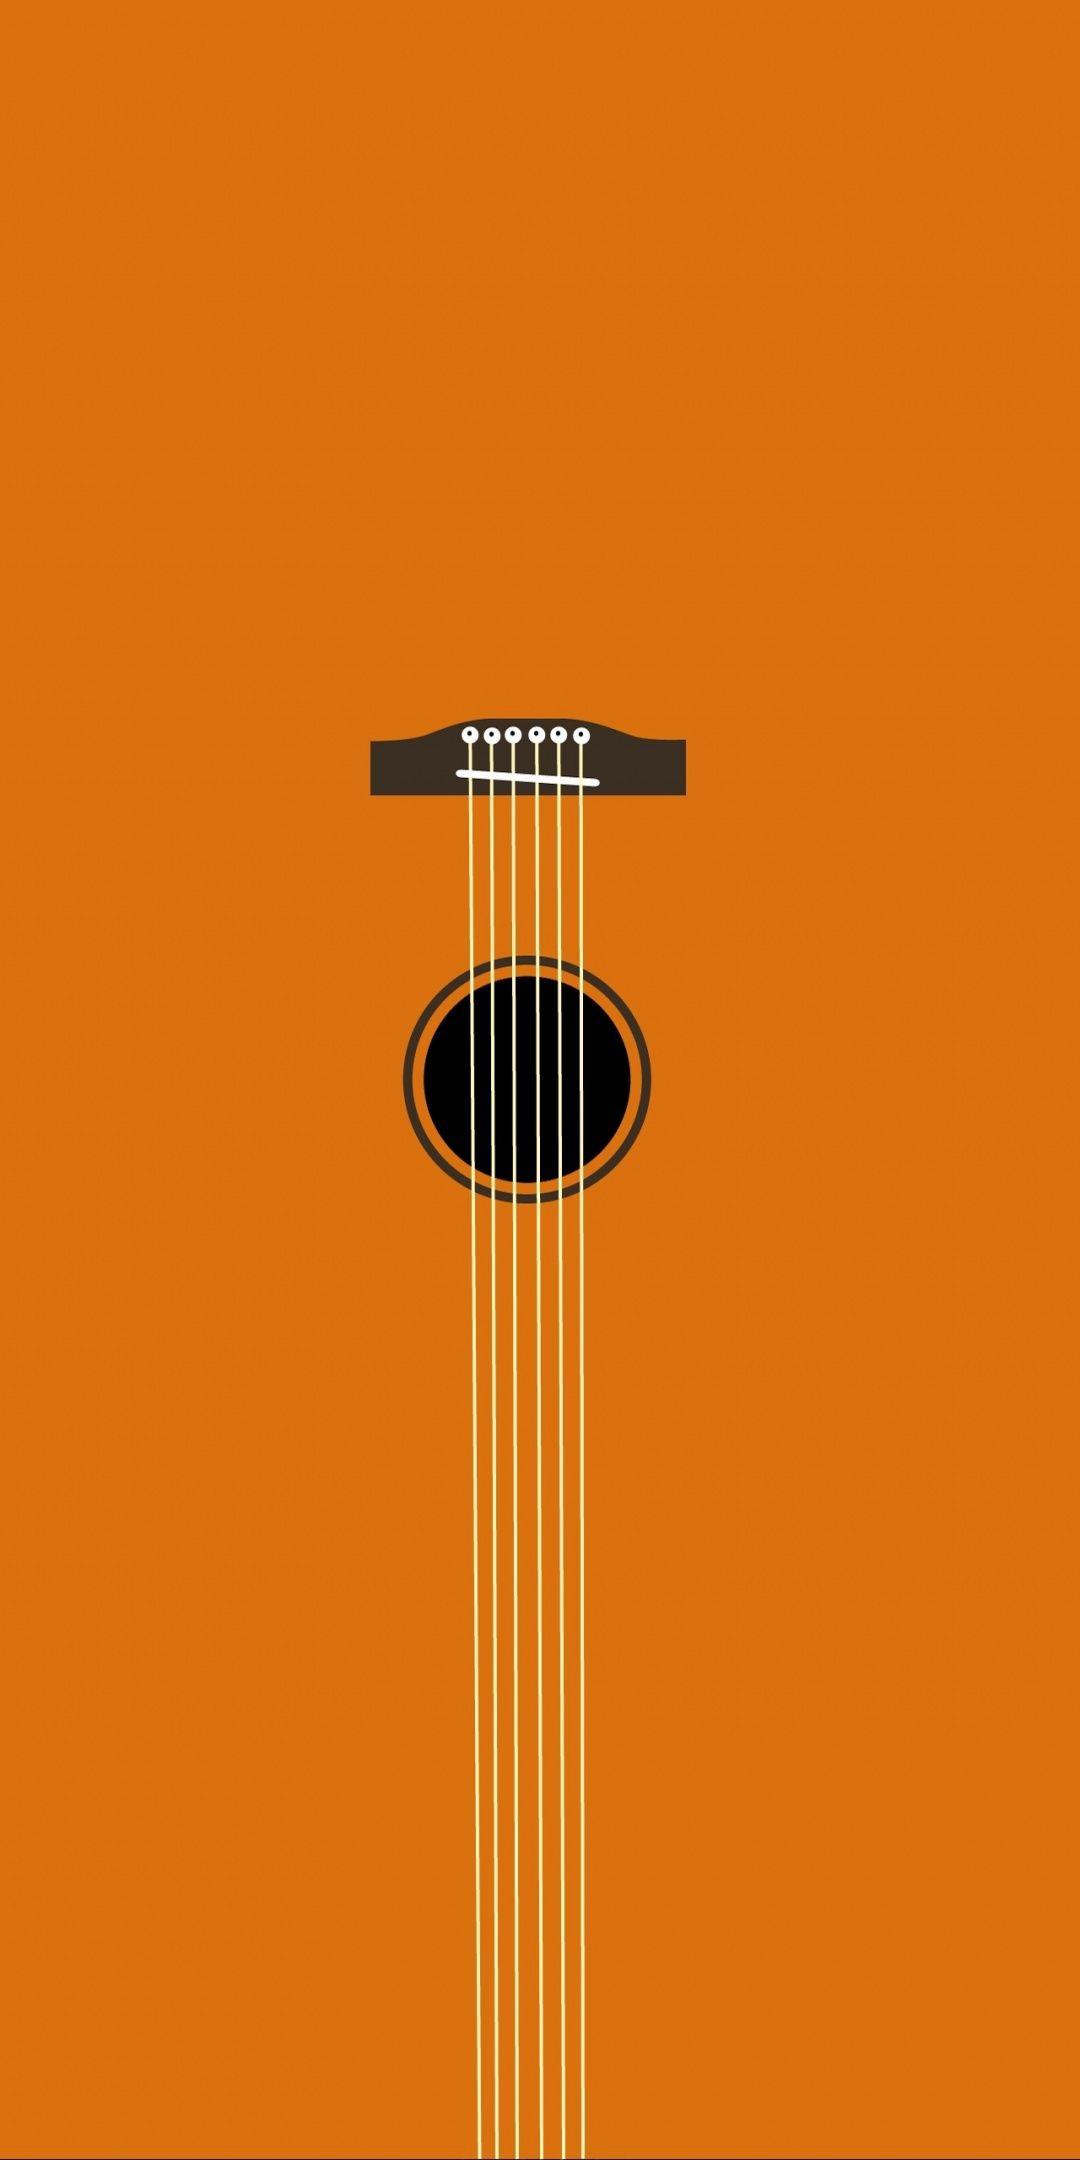 Minimal Music Guitar Art 1080x2160 Wallpaper Music Wallpaper Acoustic Guitar Photography Guitar Art